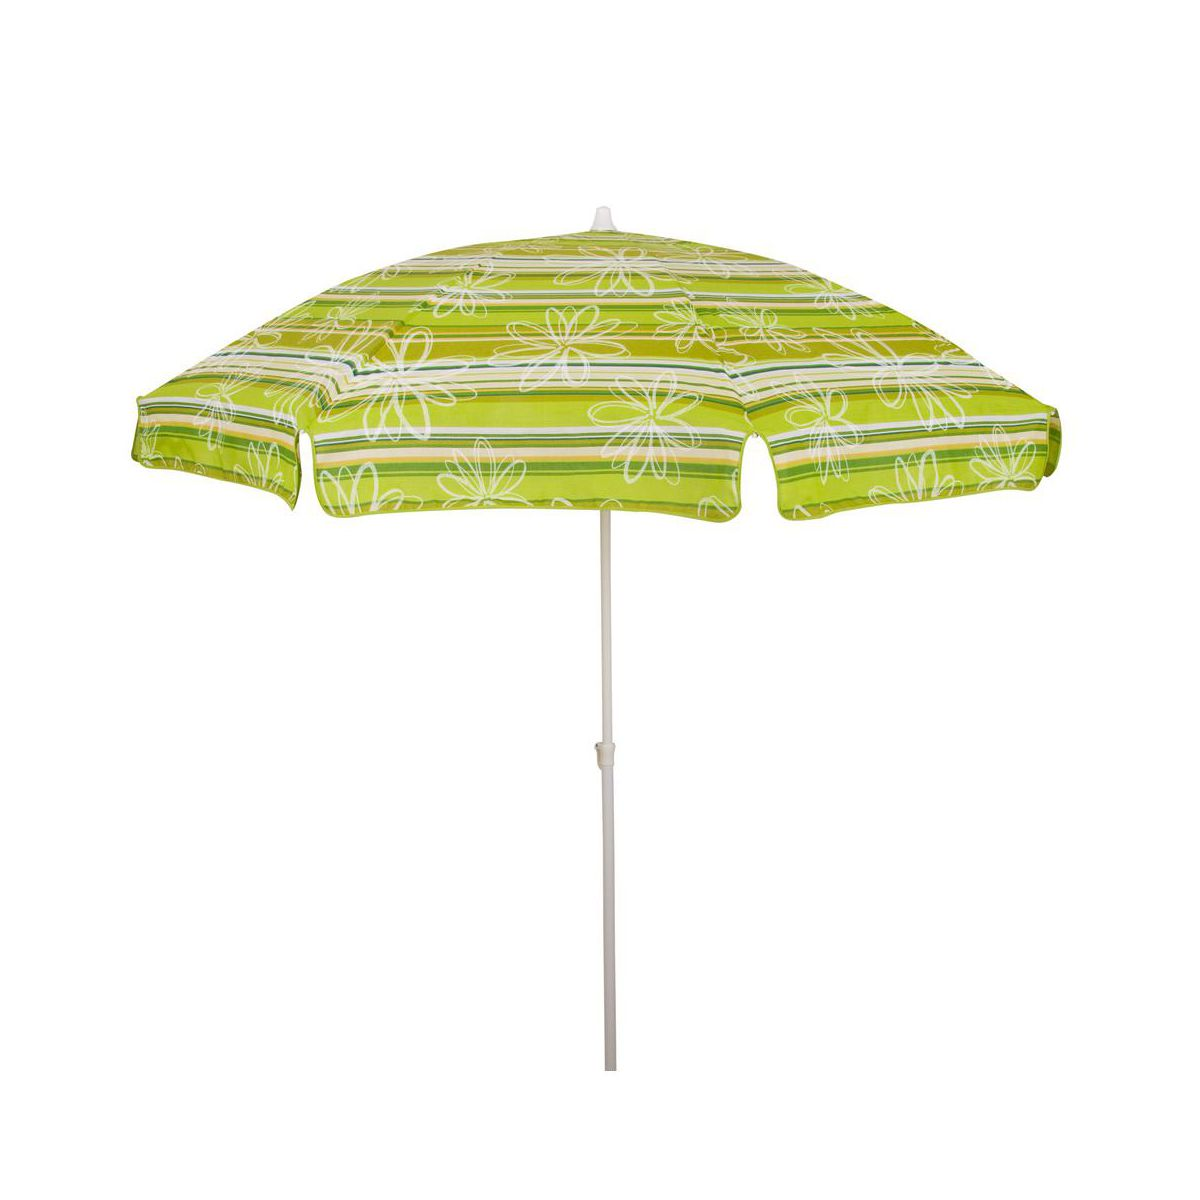 parasol ogrodowy patio parasole ogrodowe podstawy w. Black Bedroom Furniture Sets. Home Design Ideas